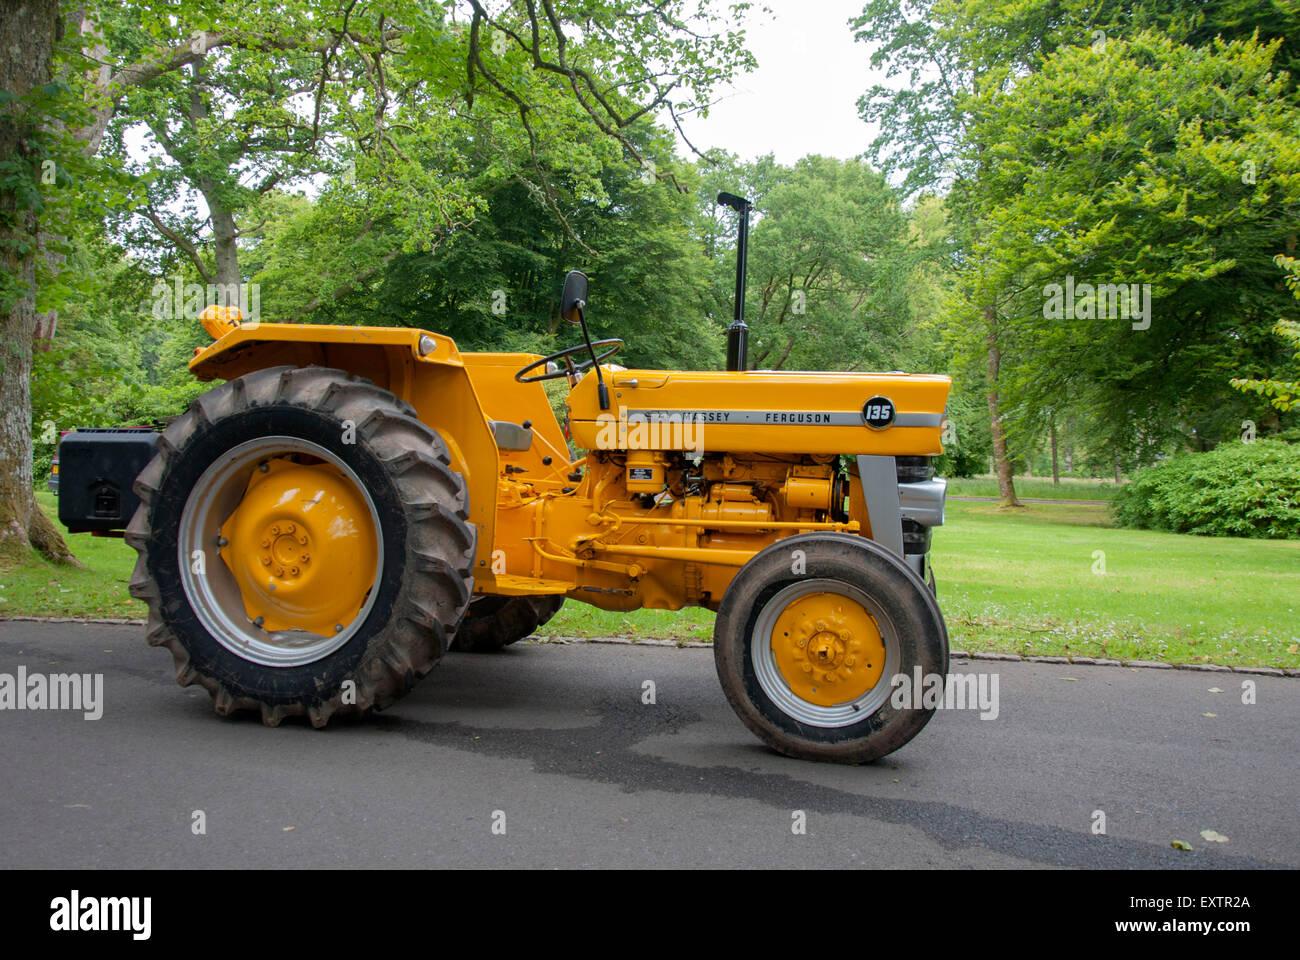 1966 Massey Ferguson Tractor : Massey ferguson tractor stock photos